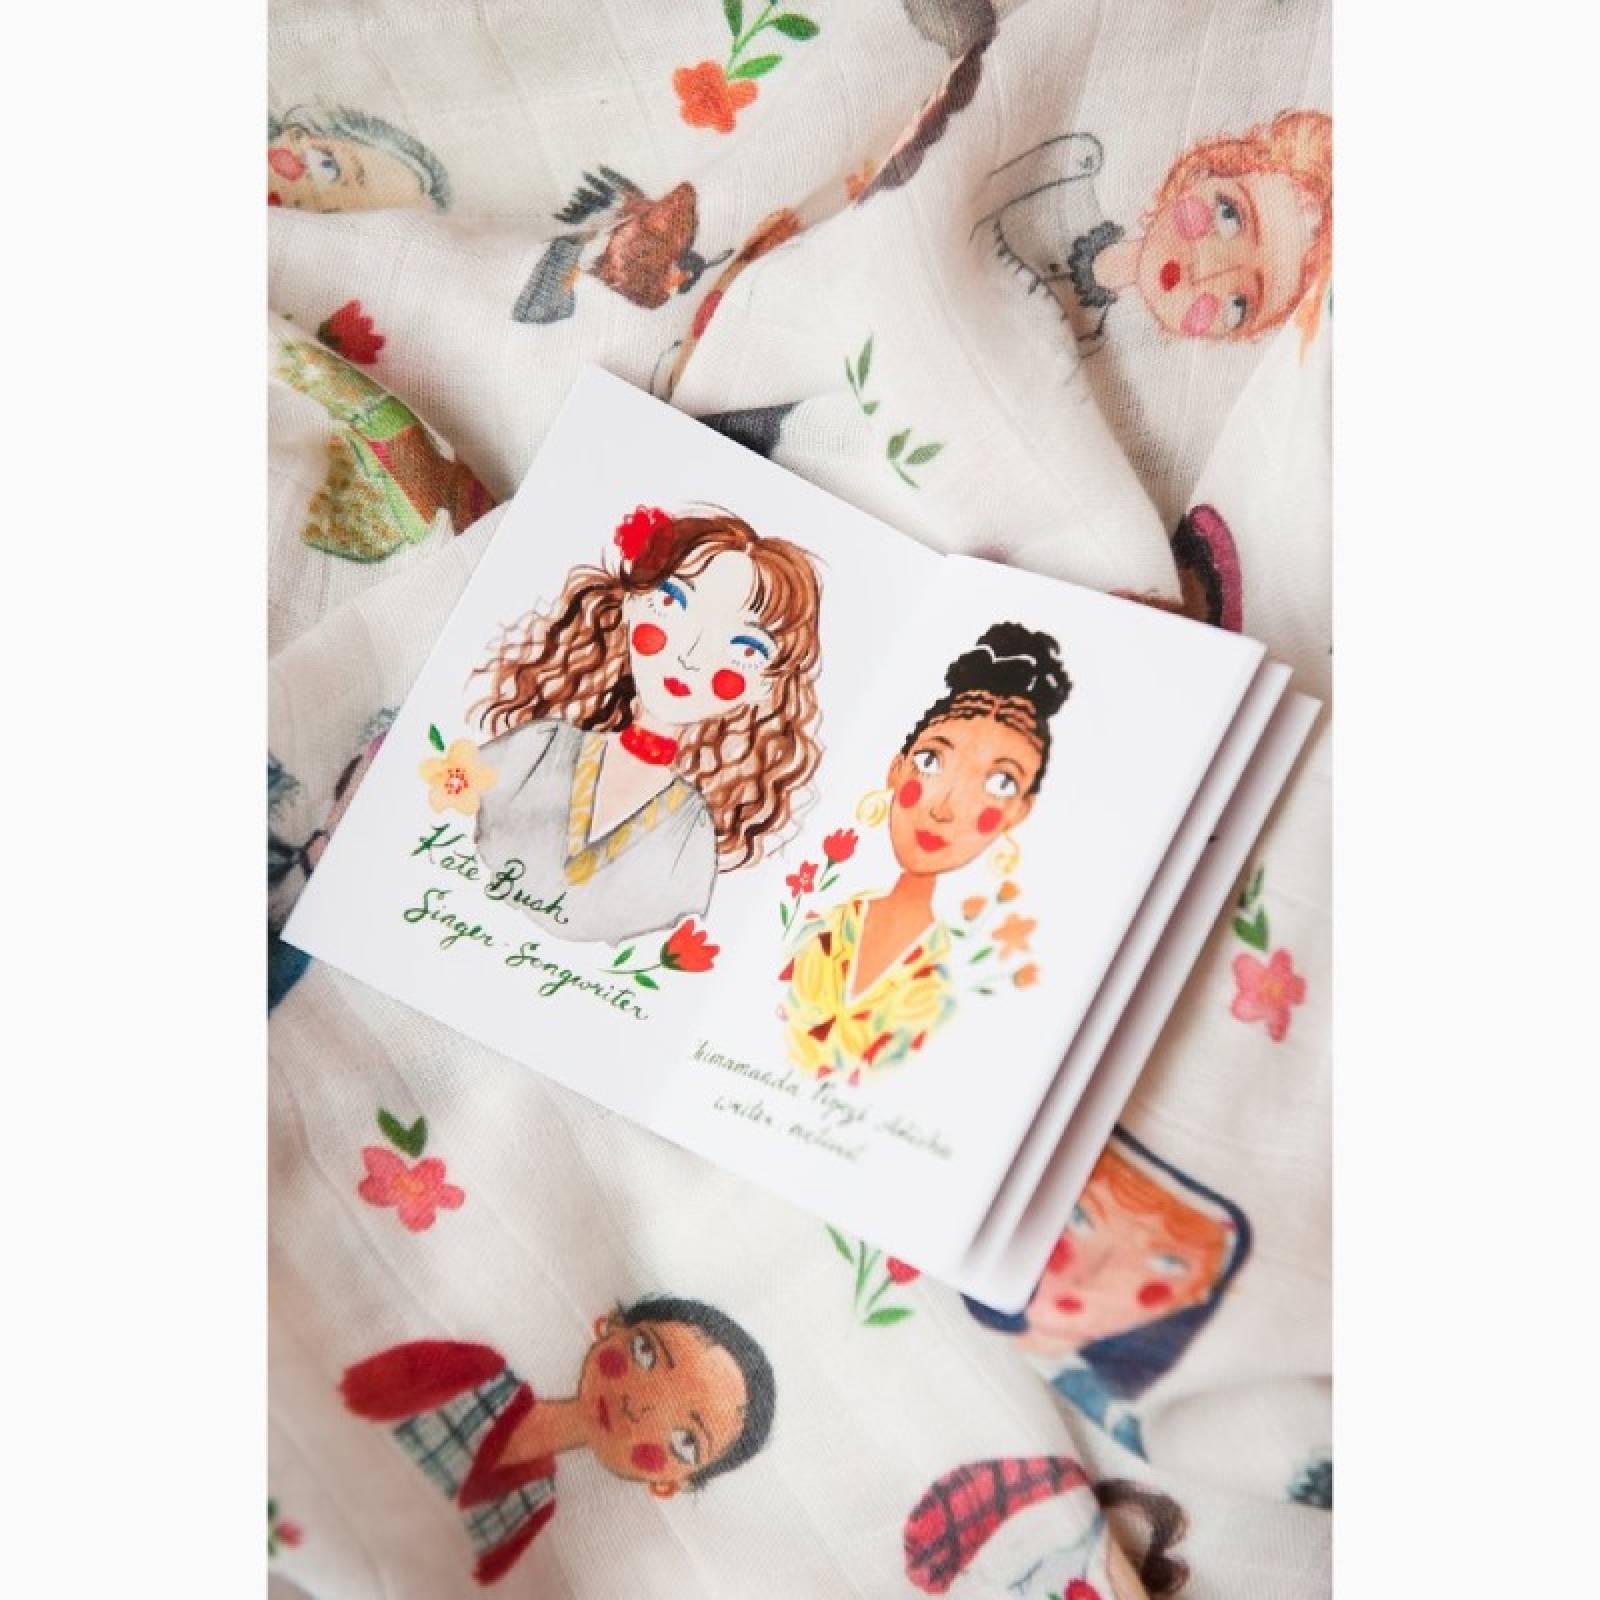 Iconic Women Swaddle Blanket & Book thumbnails